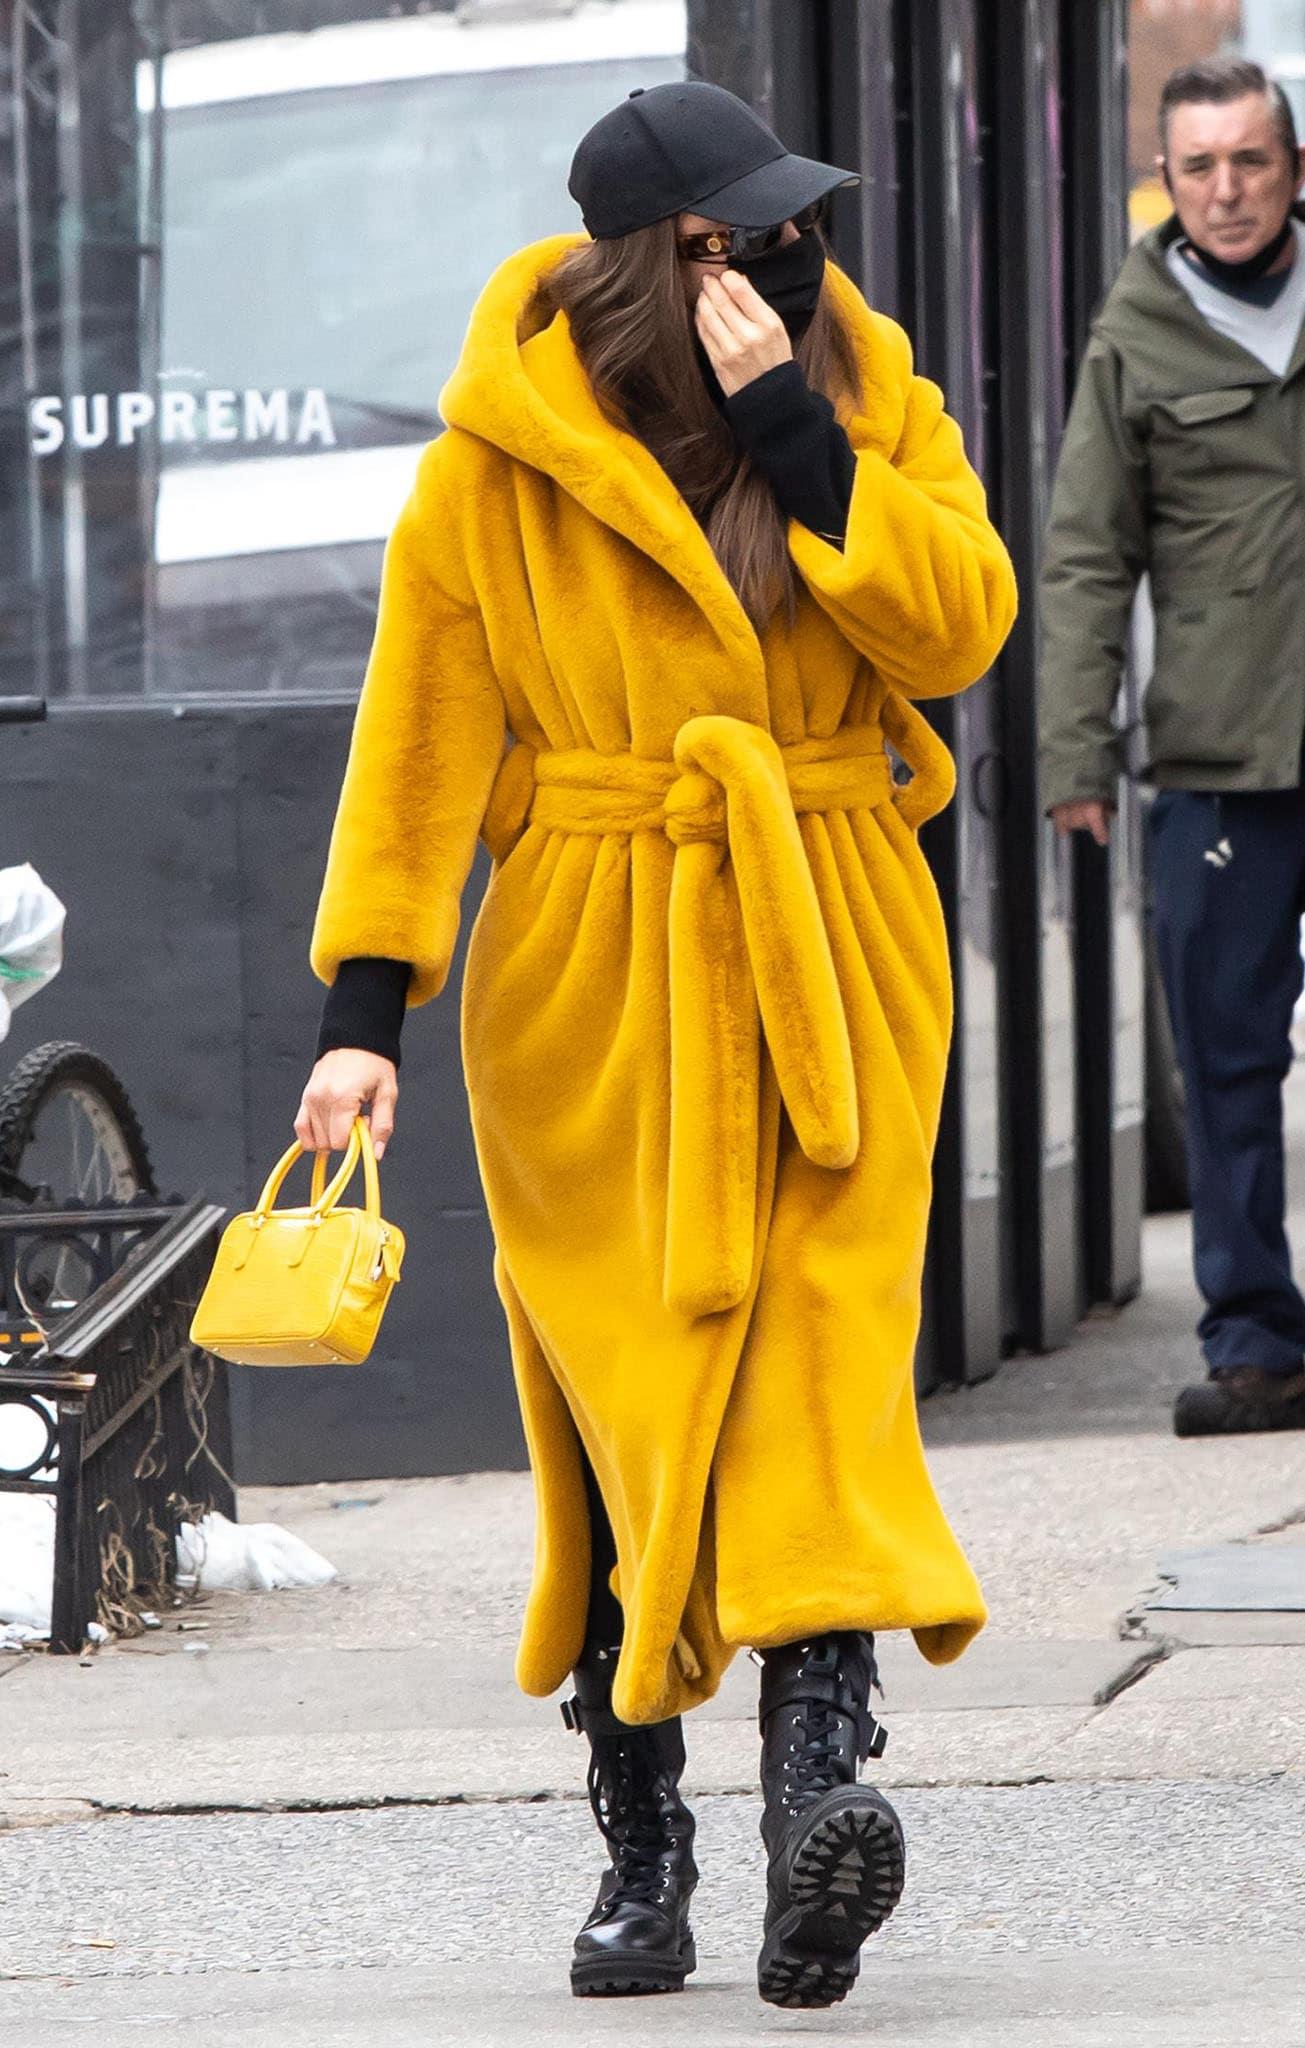 Irina Shayk wears Olēnich faux-fur yellow wrap-style coat with black Intimissimi cashmere leggings